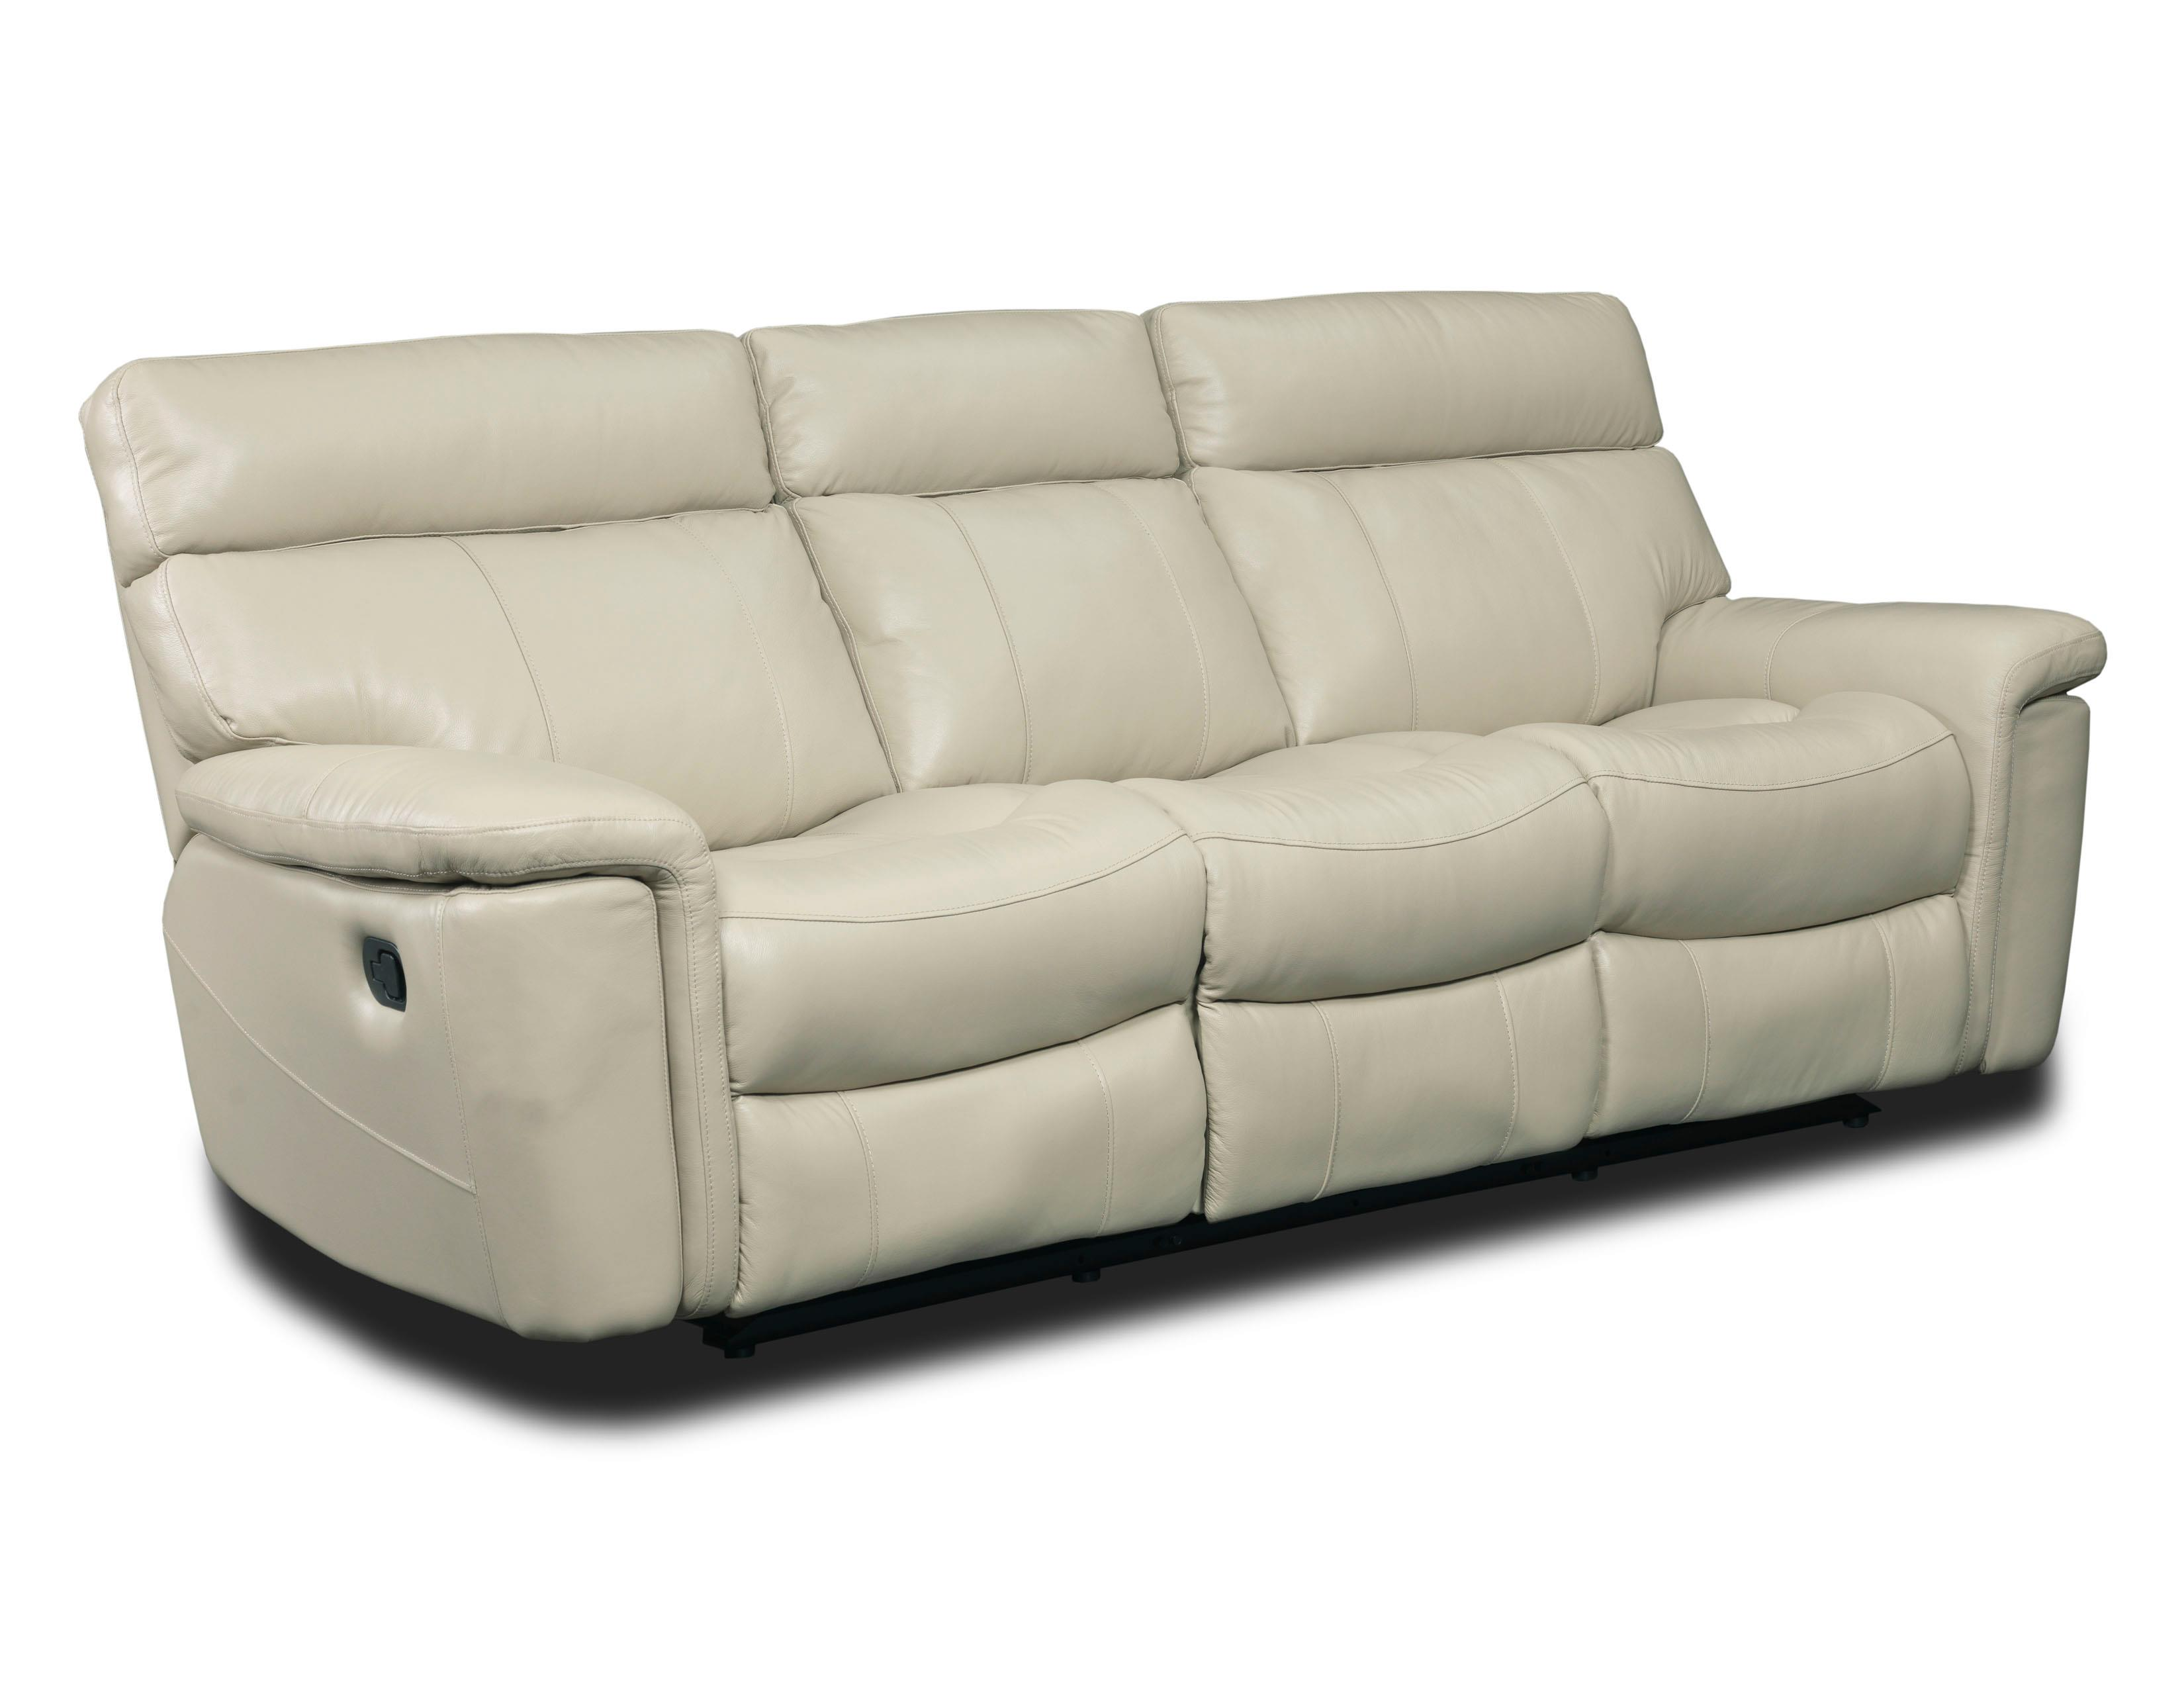 Hooker Furniture SS620 Motion Sofa - Item Number: SS620-03-082